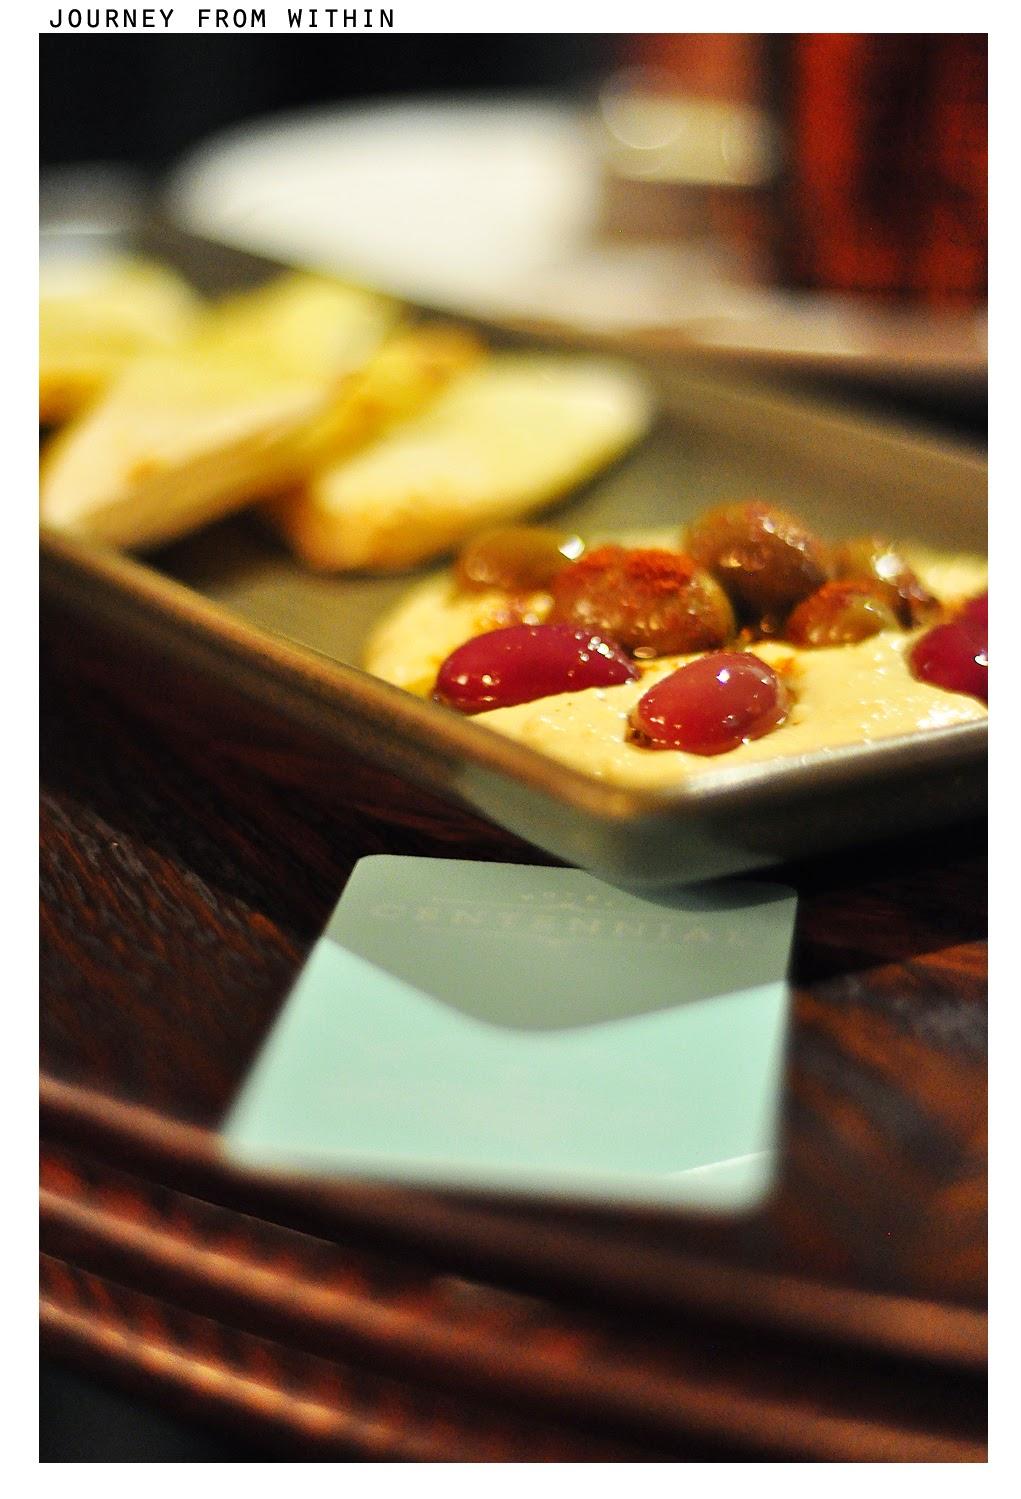 Hummus, olives, garlic & herb flatbread